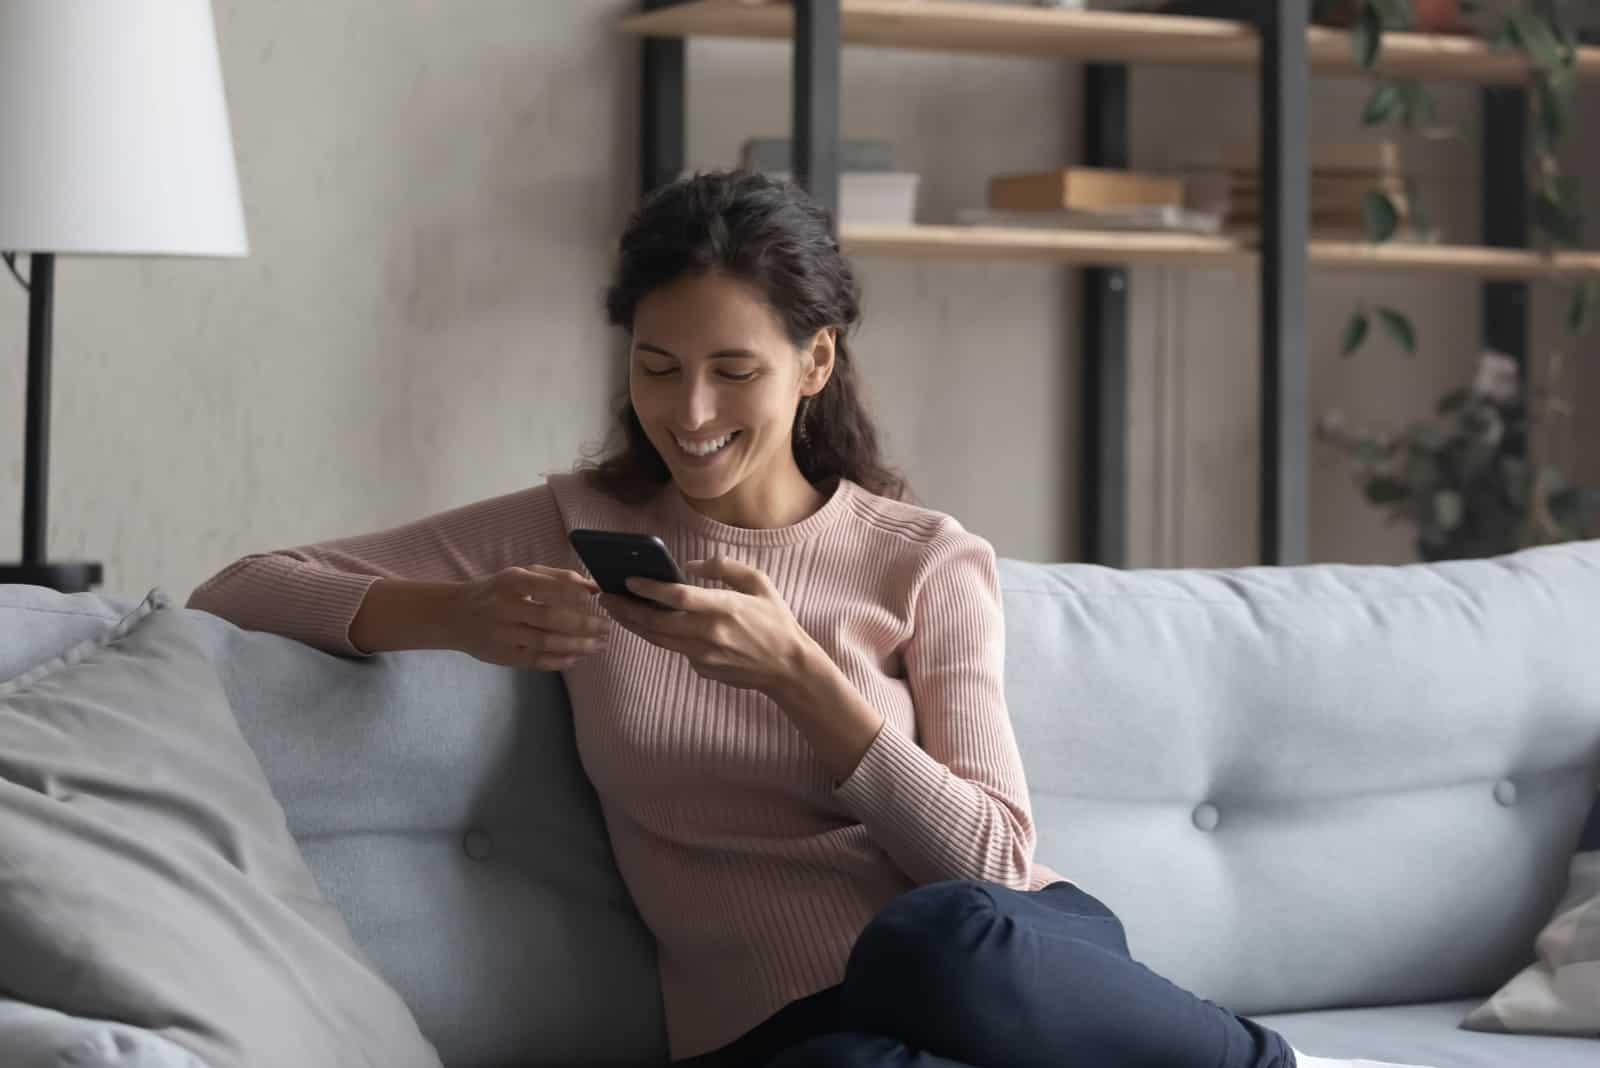 smiling millennial girl using cellphone